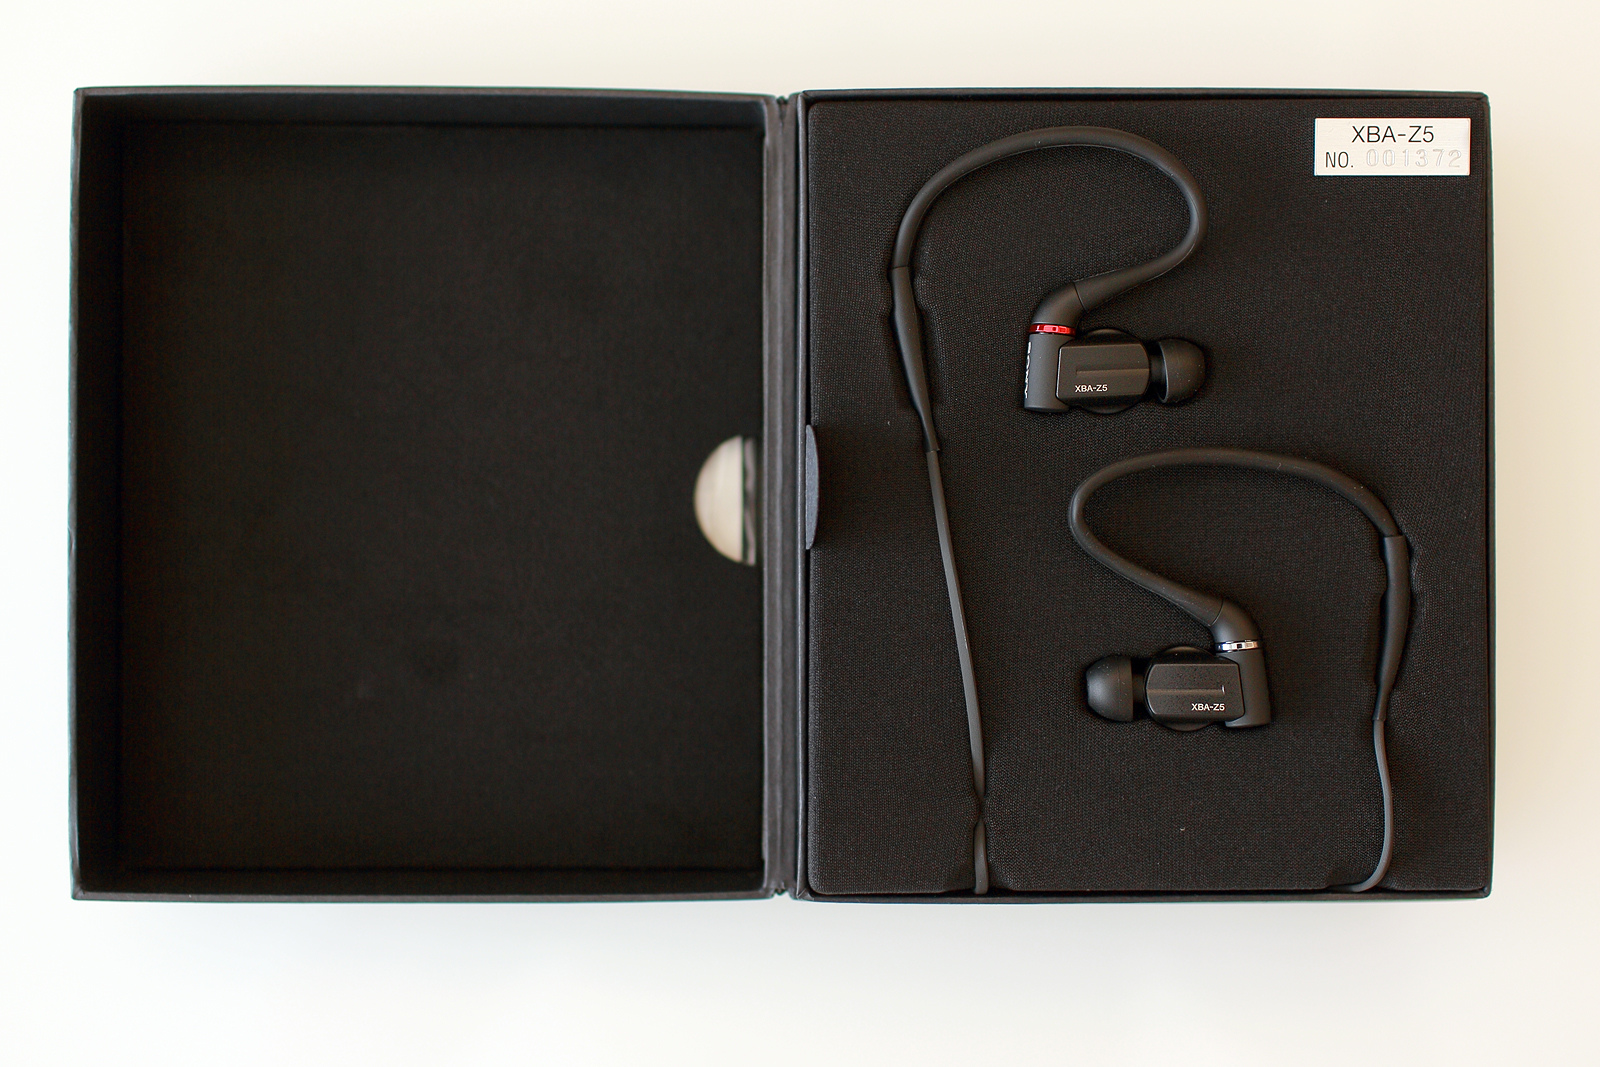 Sony XBA-Z5 004.JPG